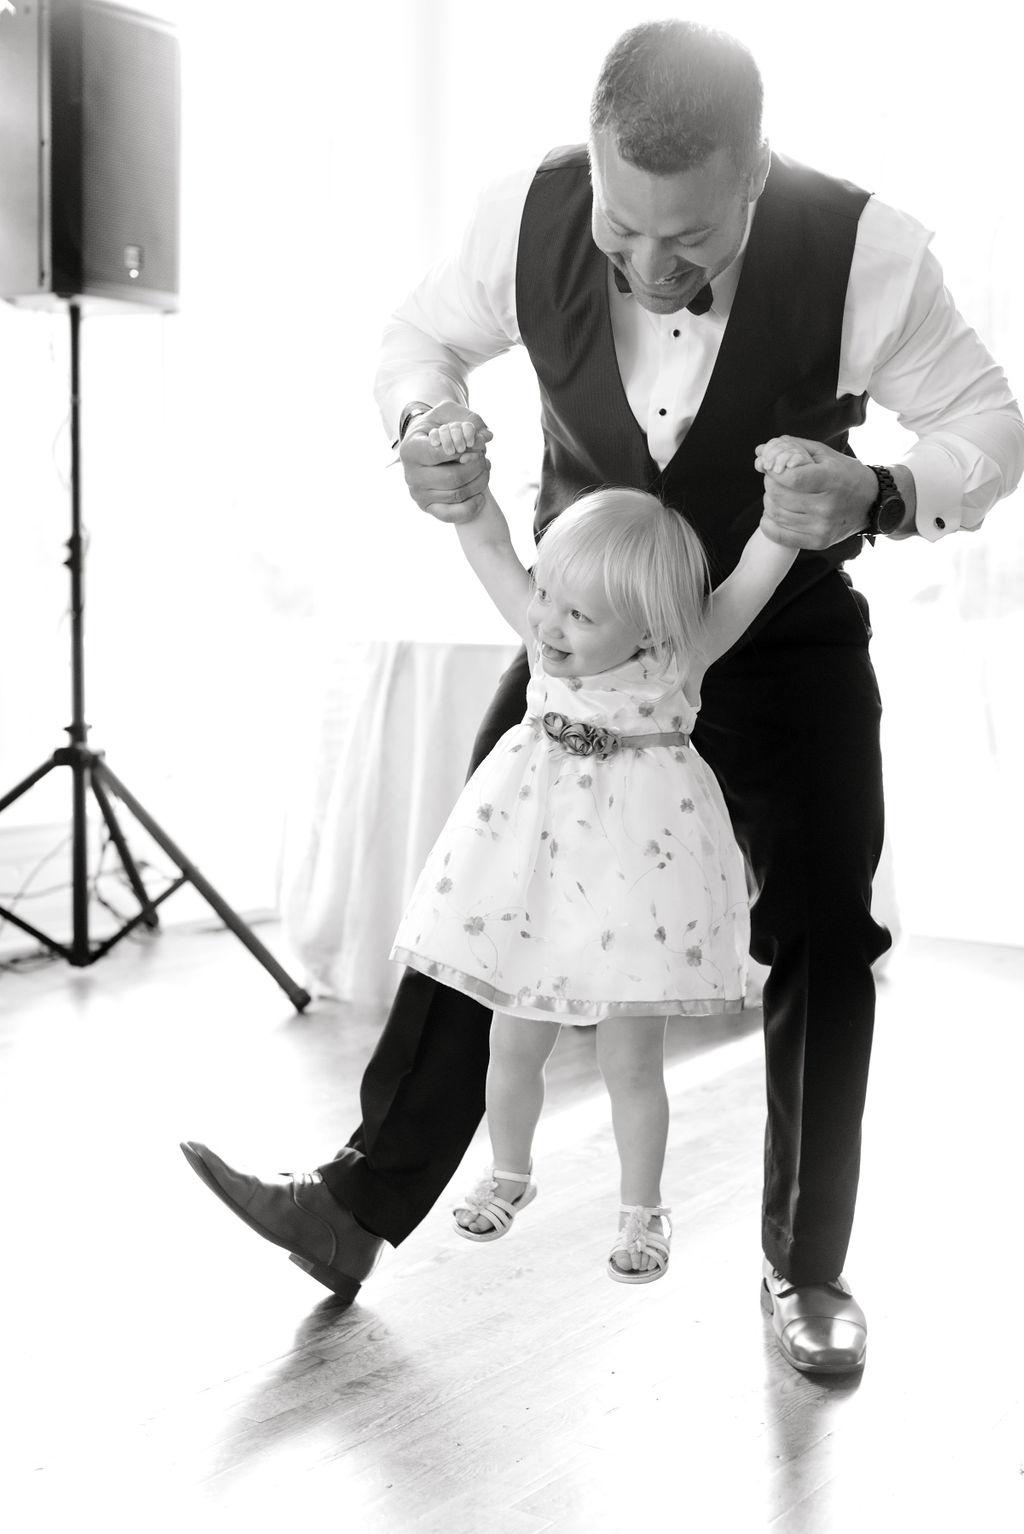 Dayton-event-planner-wedding-groom-and-daughter-dancing-wedding